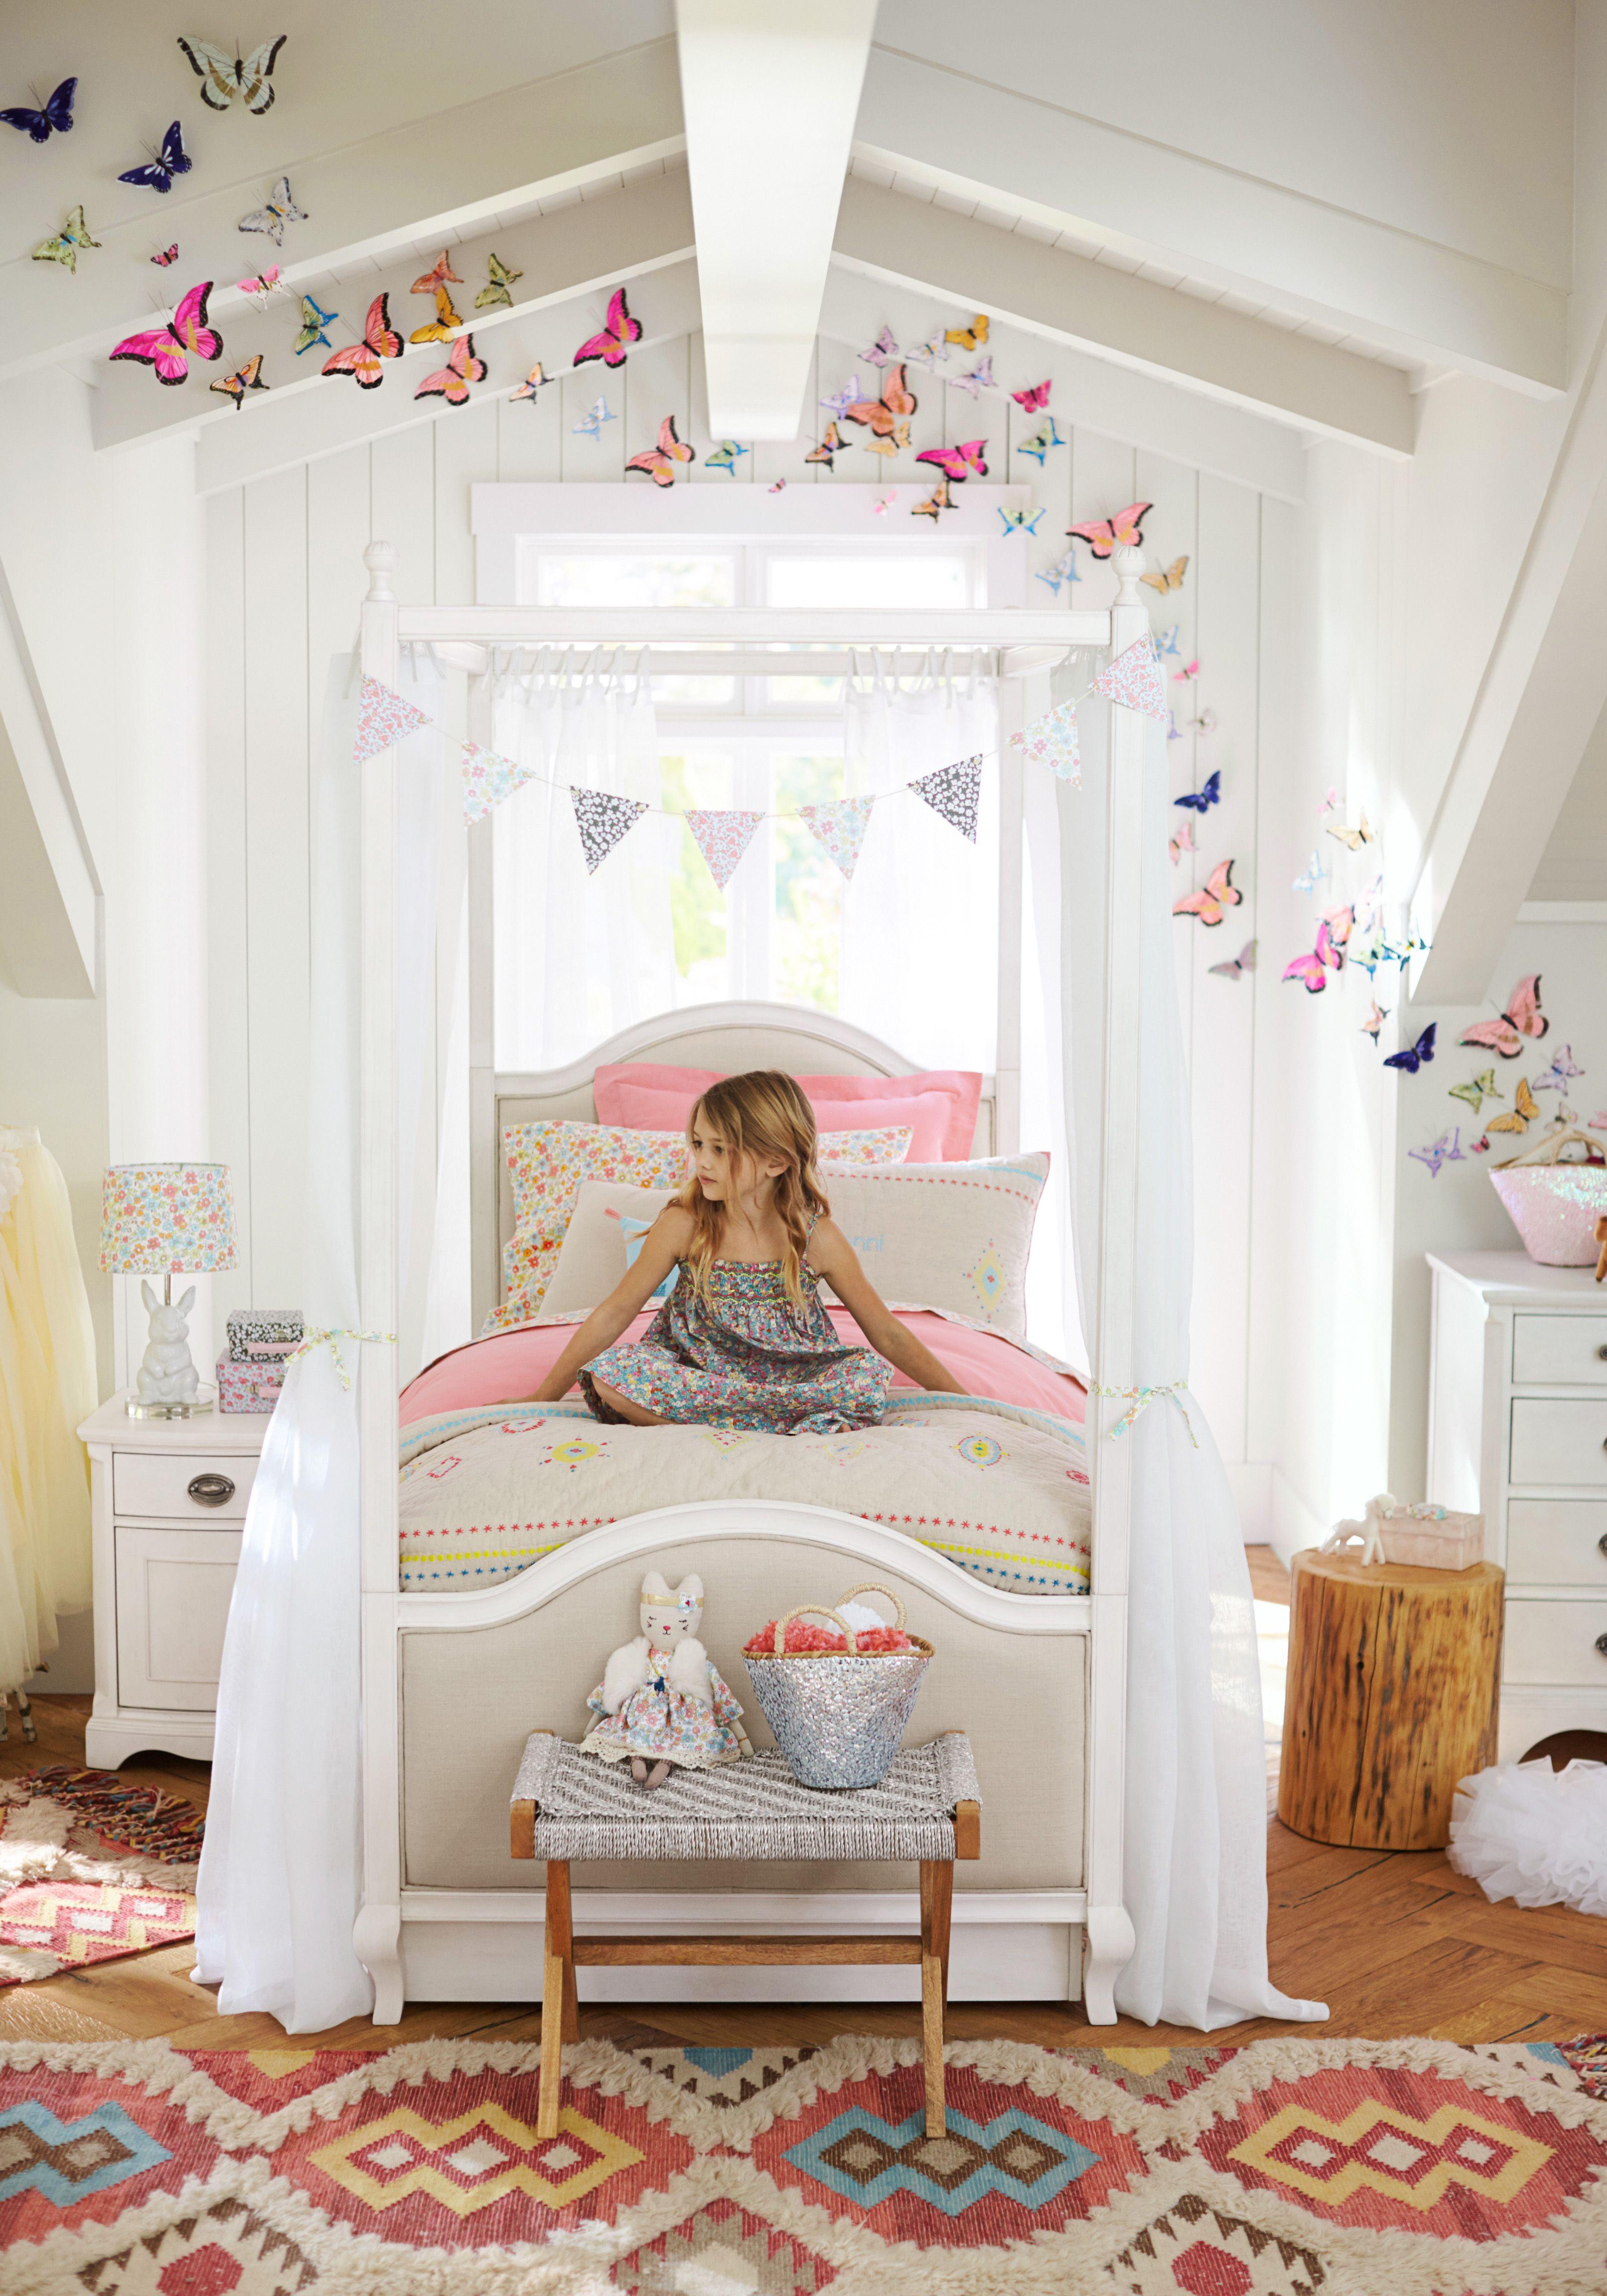 Nursery decor | Design: Bedroom | Pinterest | Girls bedroom, Pottery ...